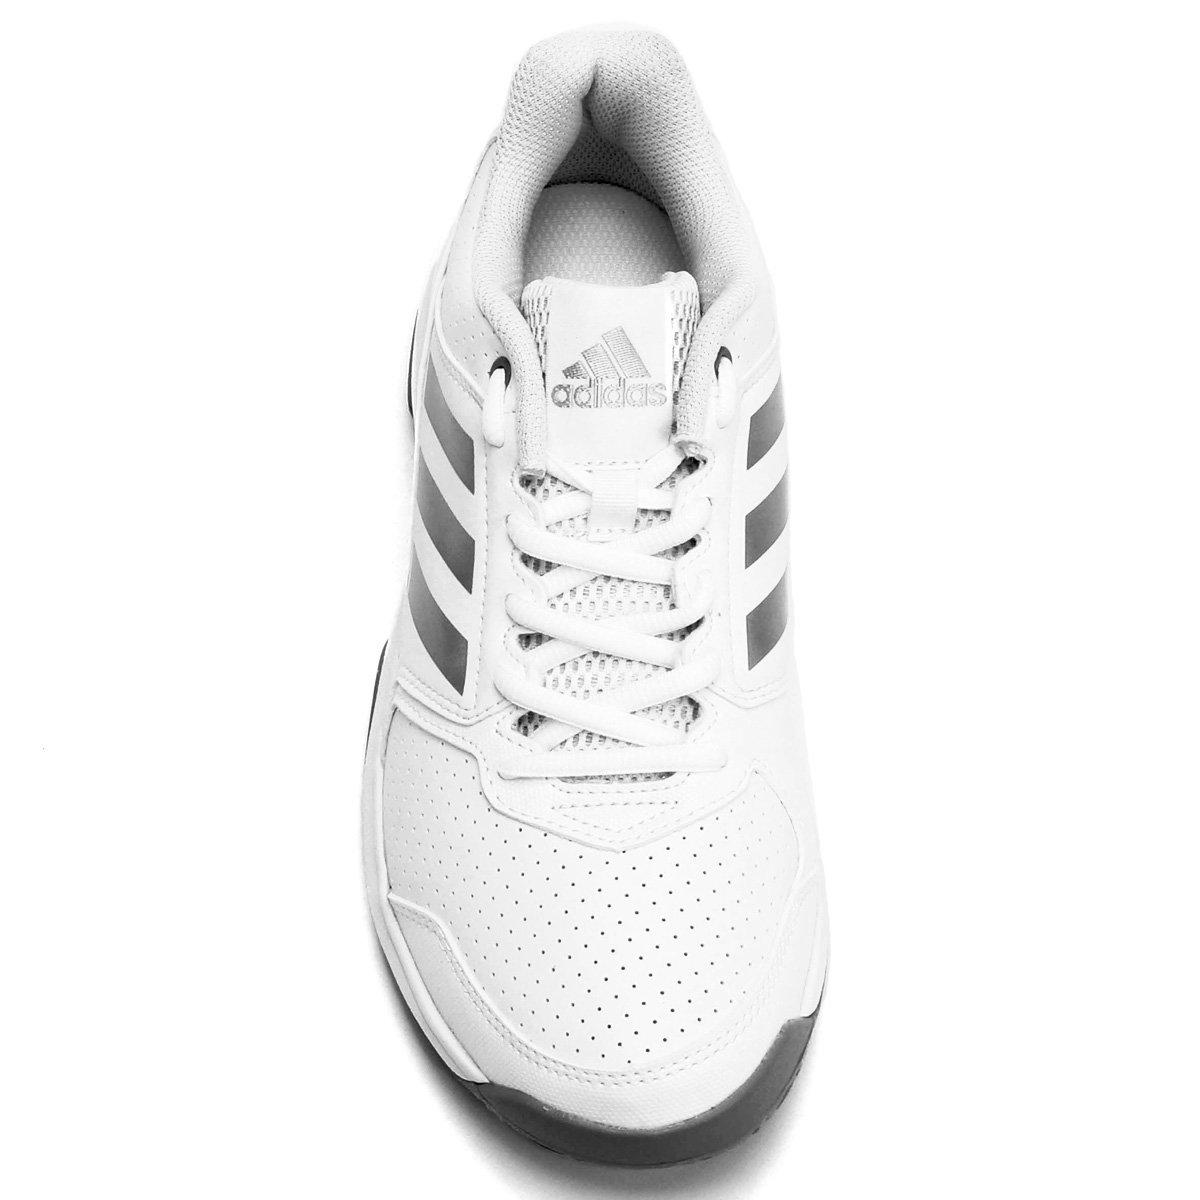 Tênis Adidas Adizero Attack Feminino - Branco - Compre Agora  5363869d5ee6a